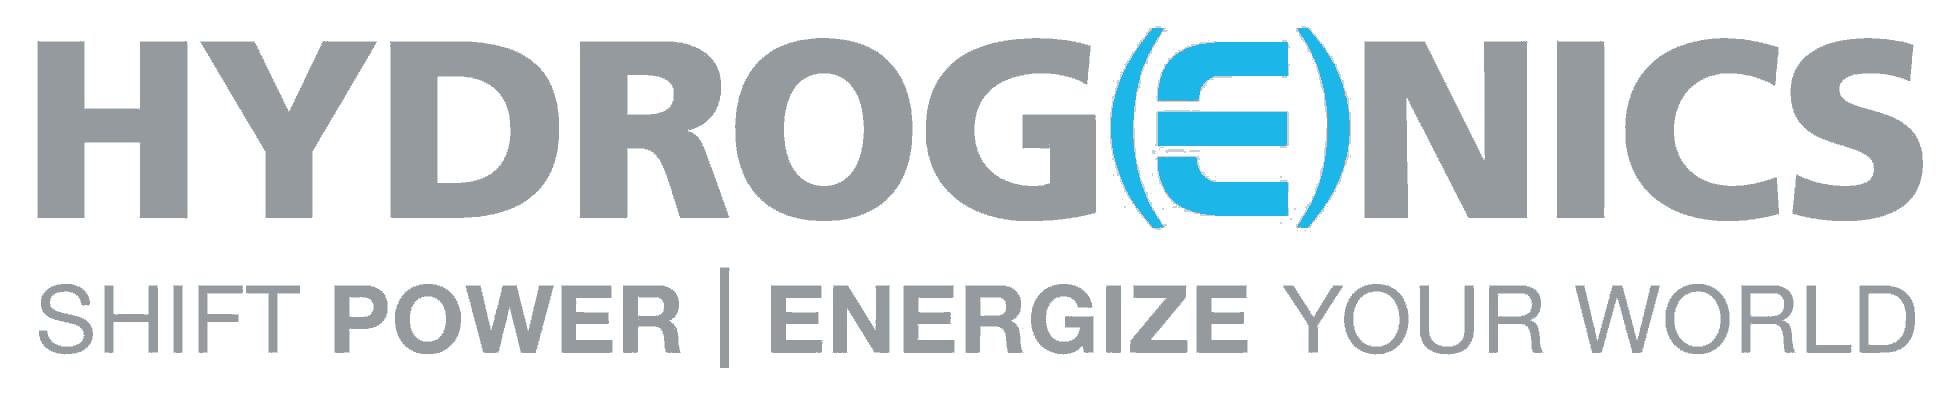 Hydrogenics